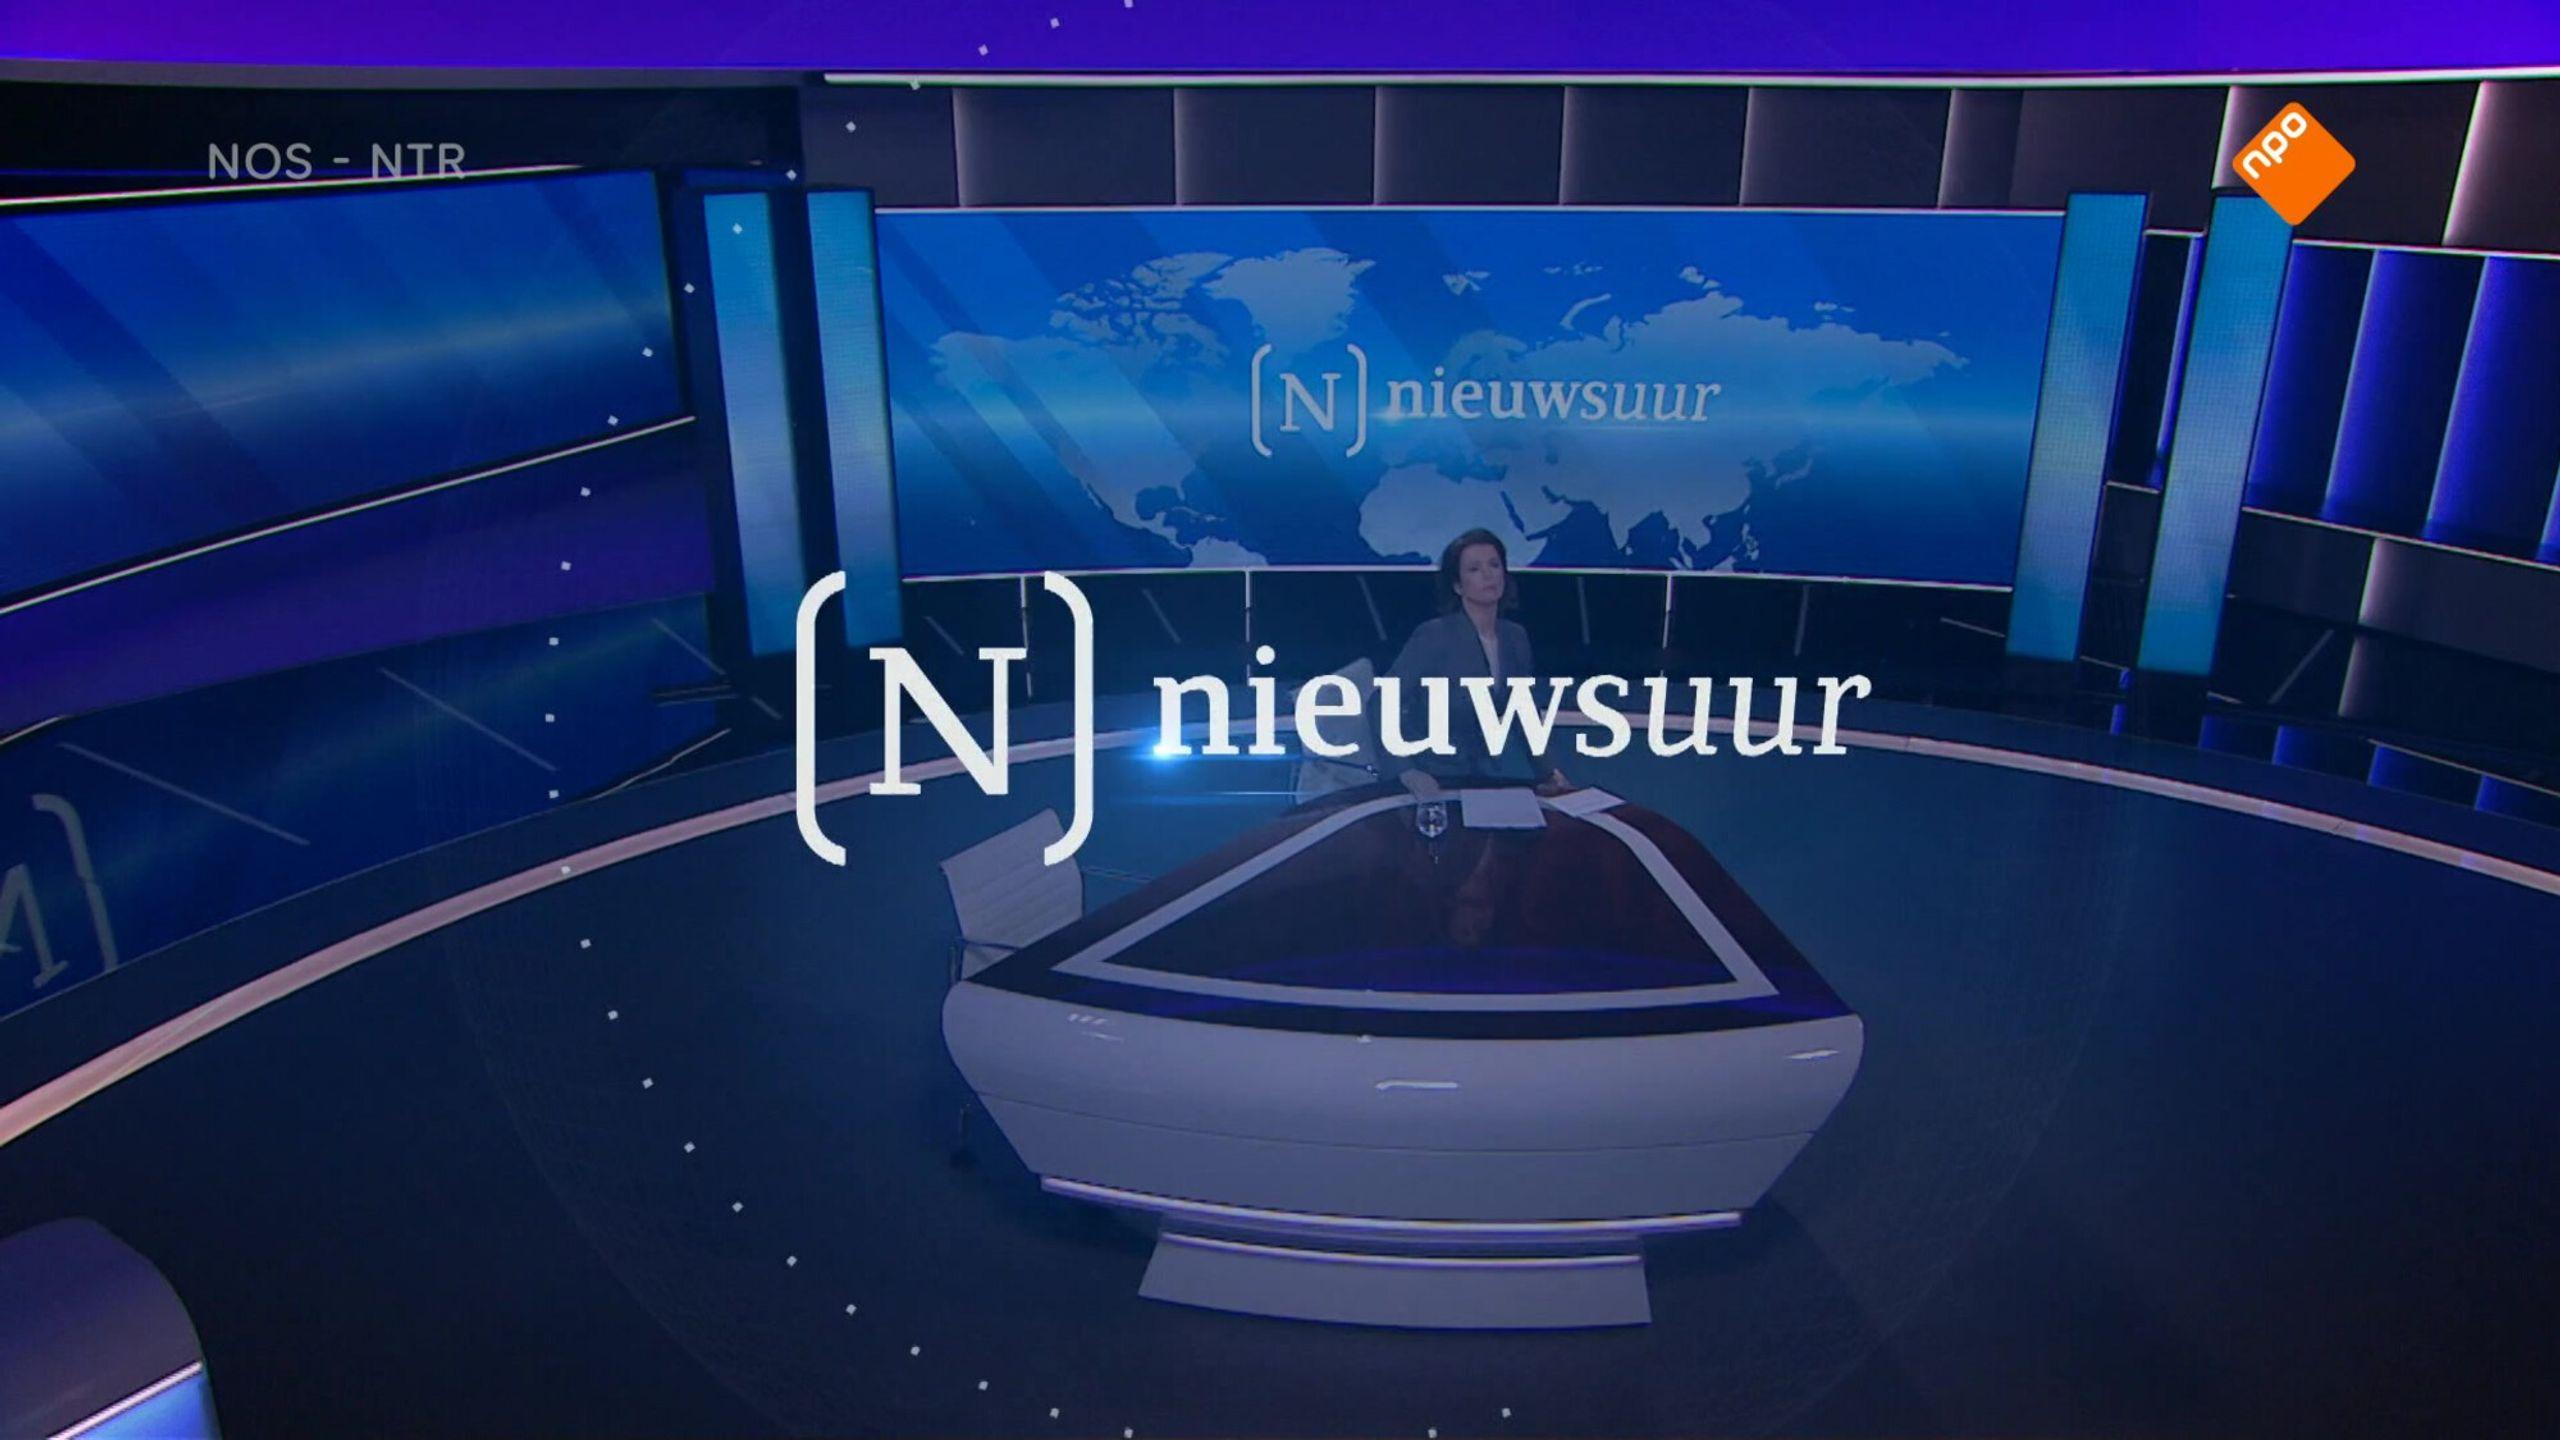 kennis tv